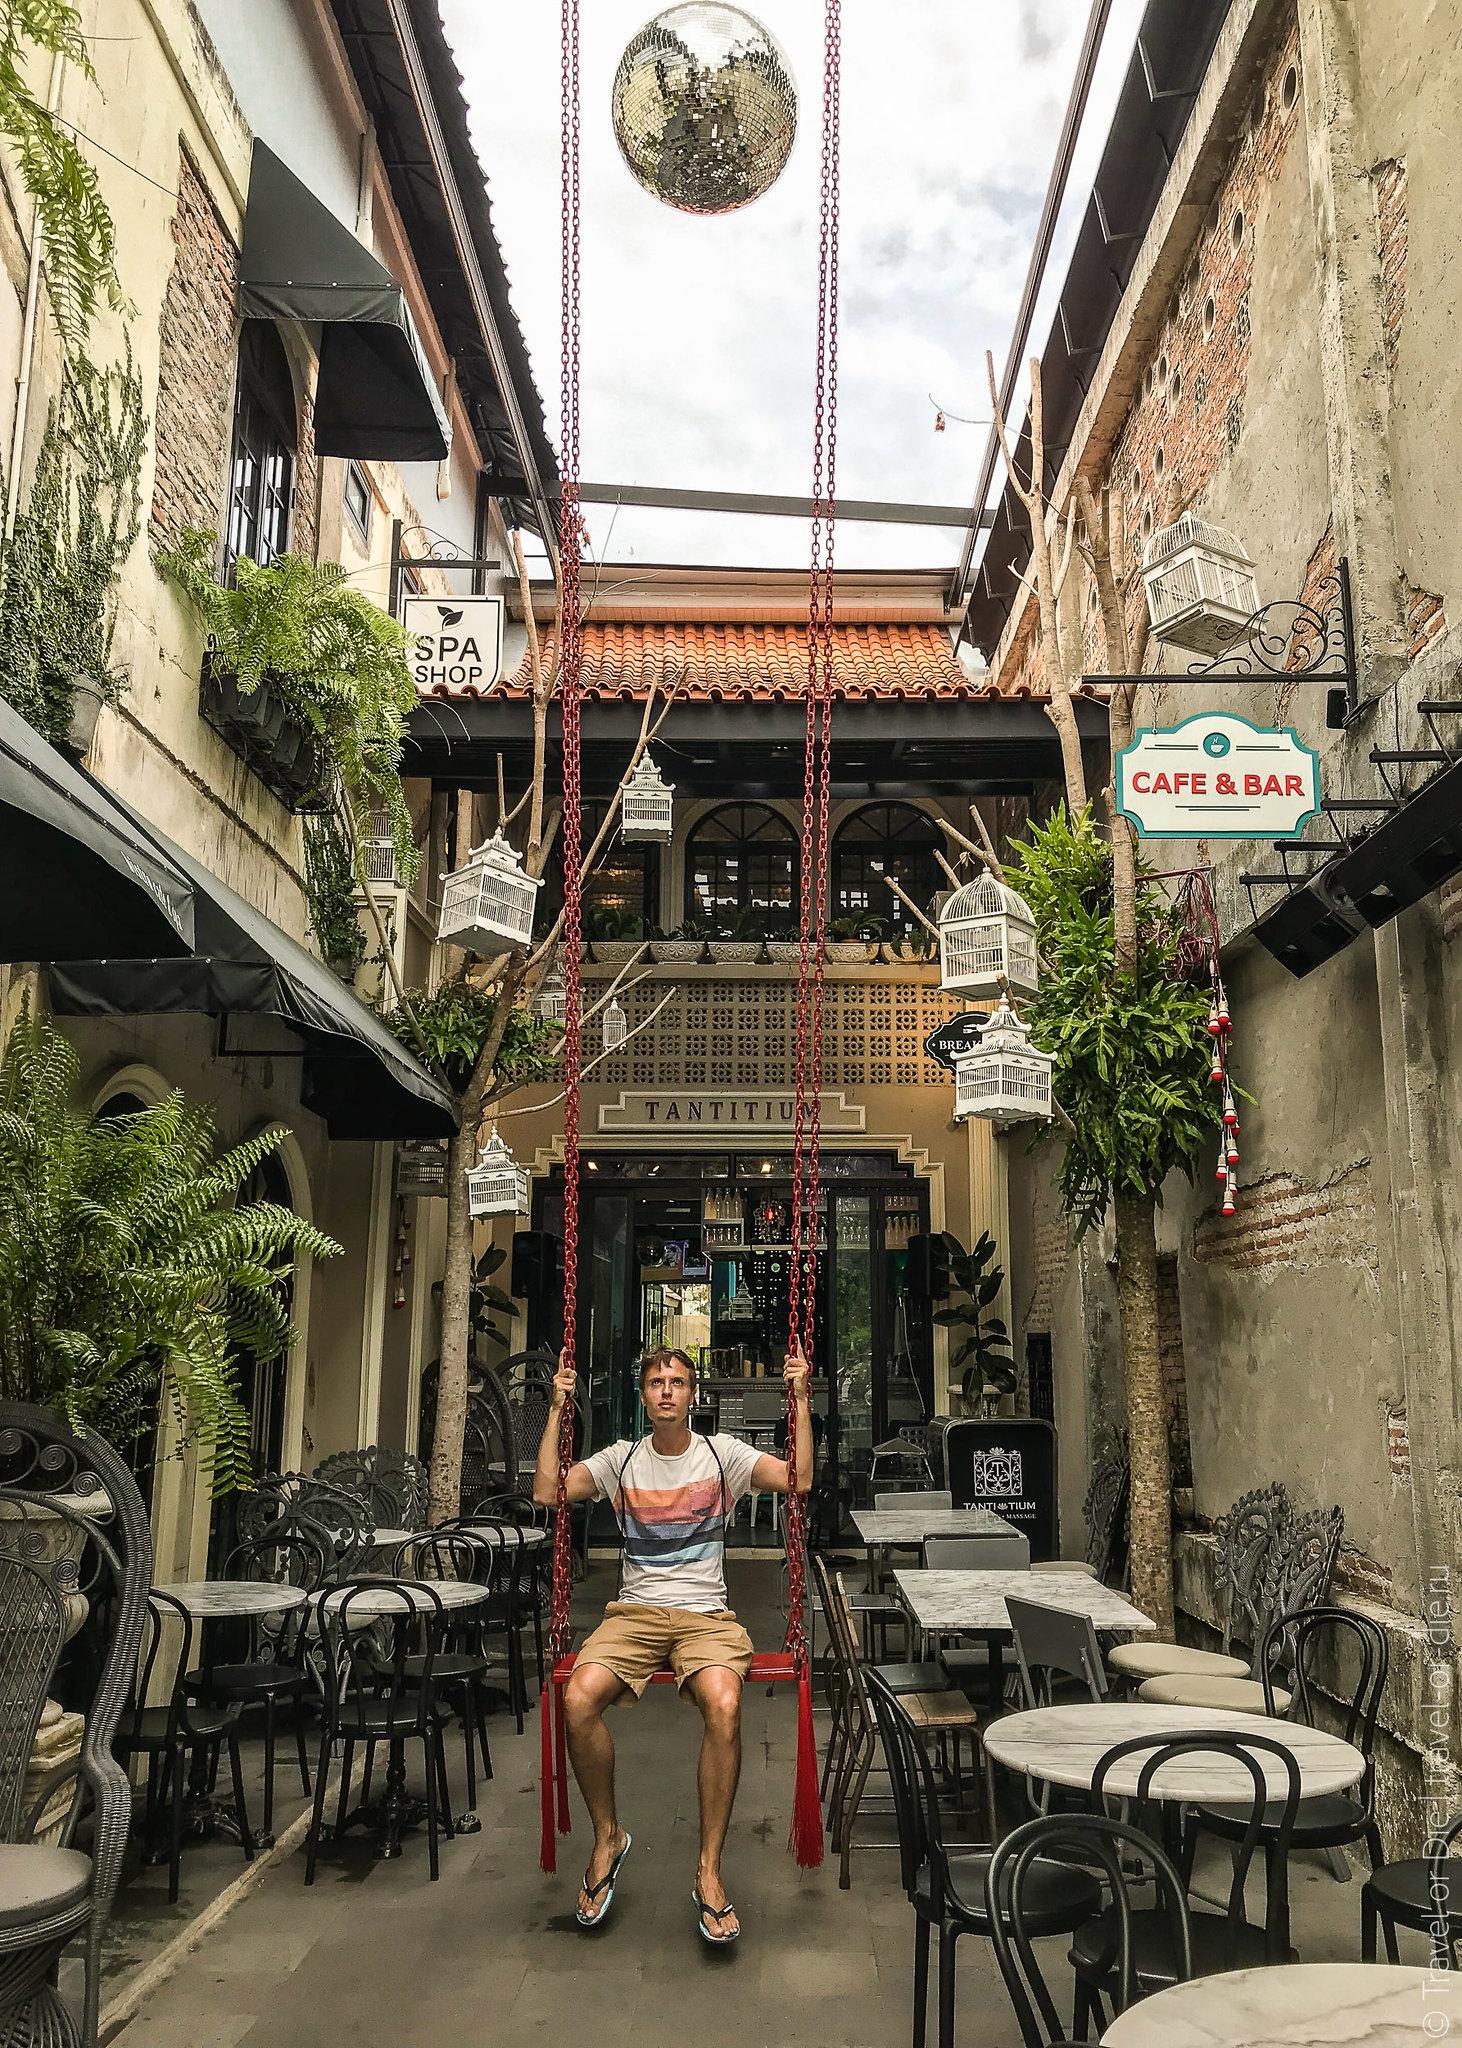 Phuket-Town-Old-Town-Thailand-3422